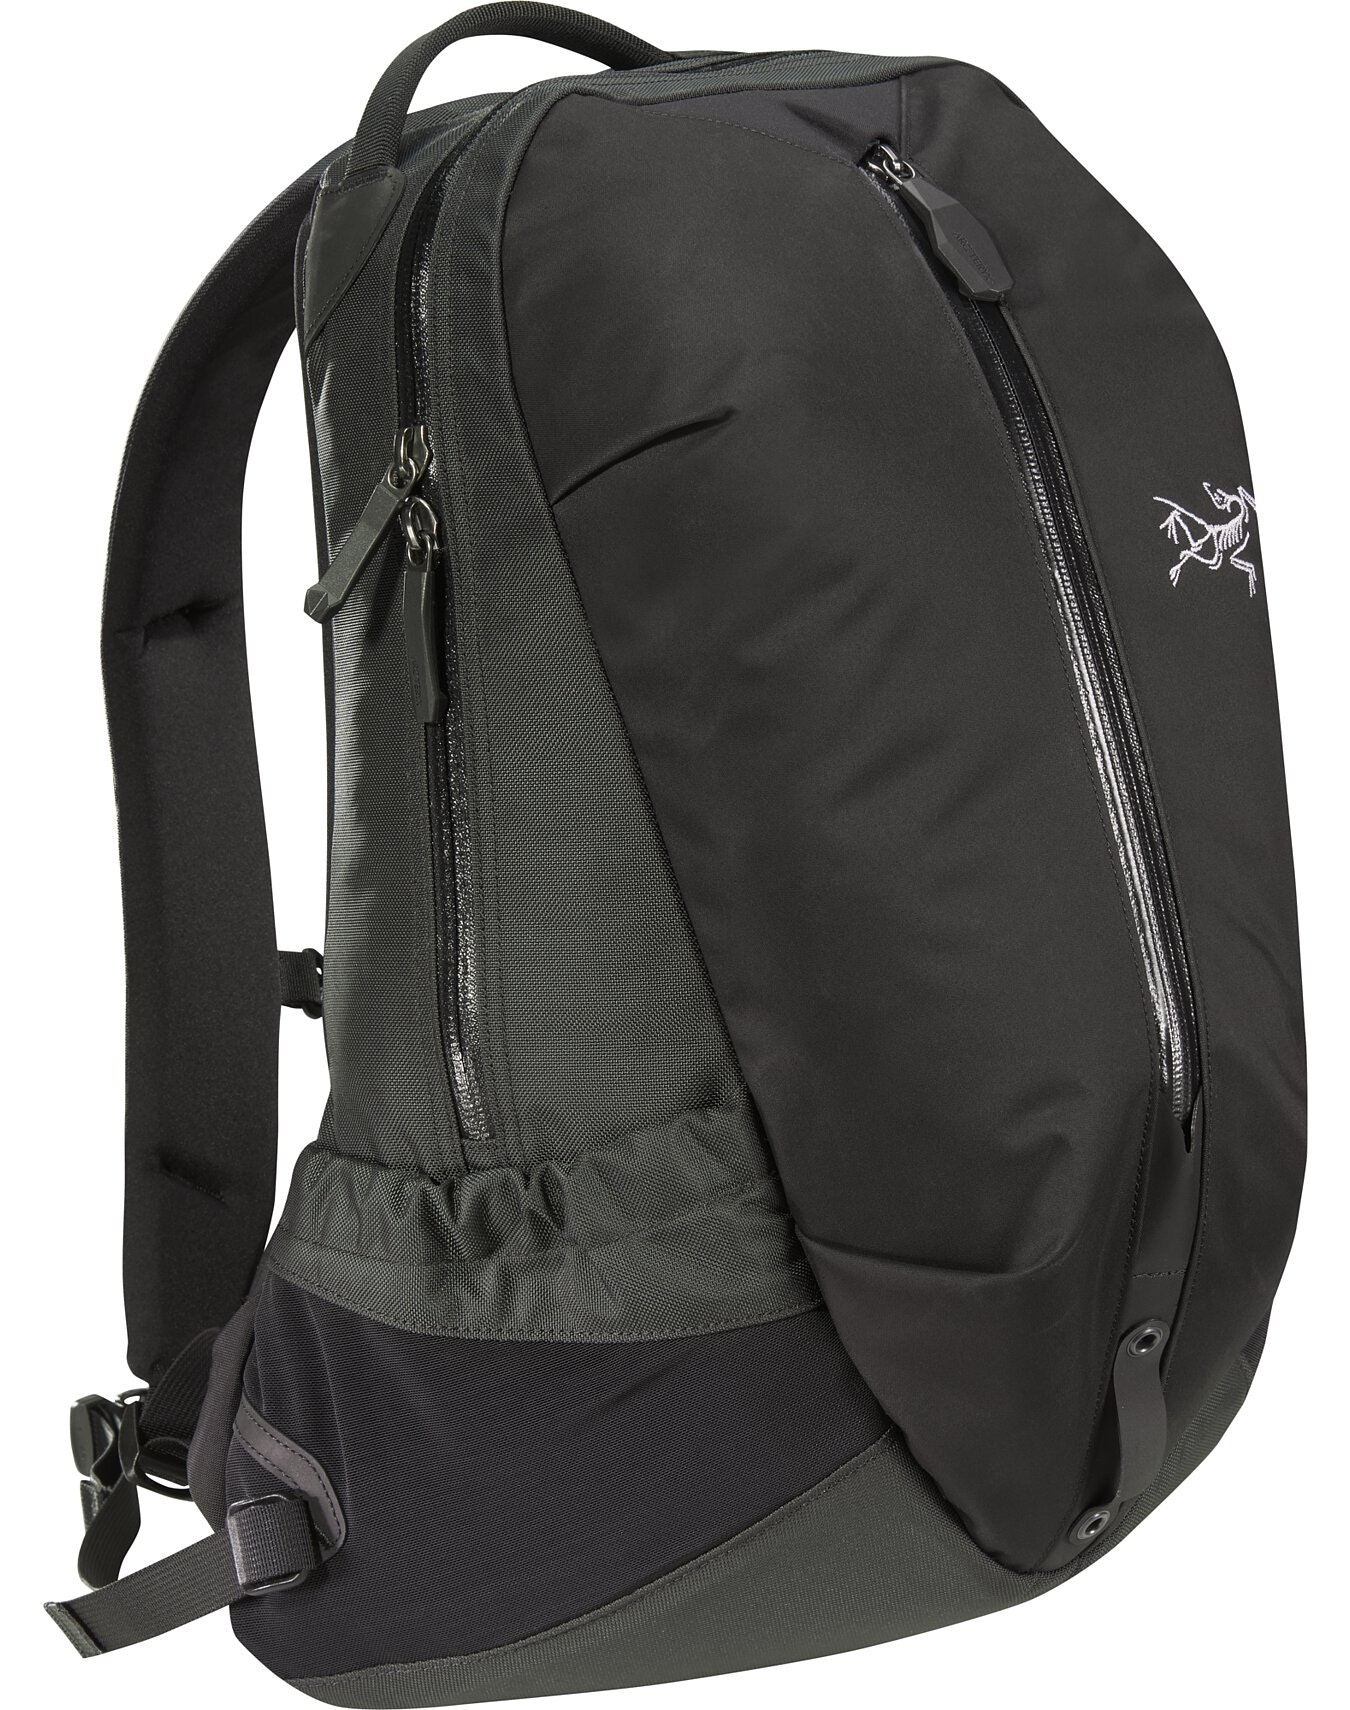 Arro 16 Backpack Carbon Copy